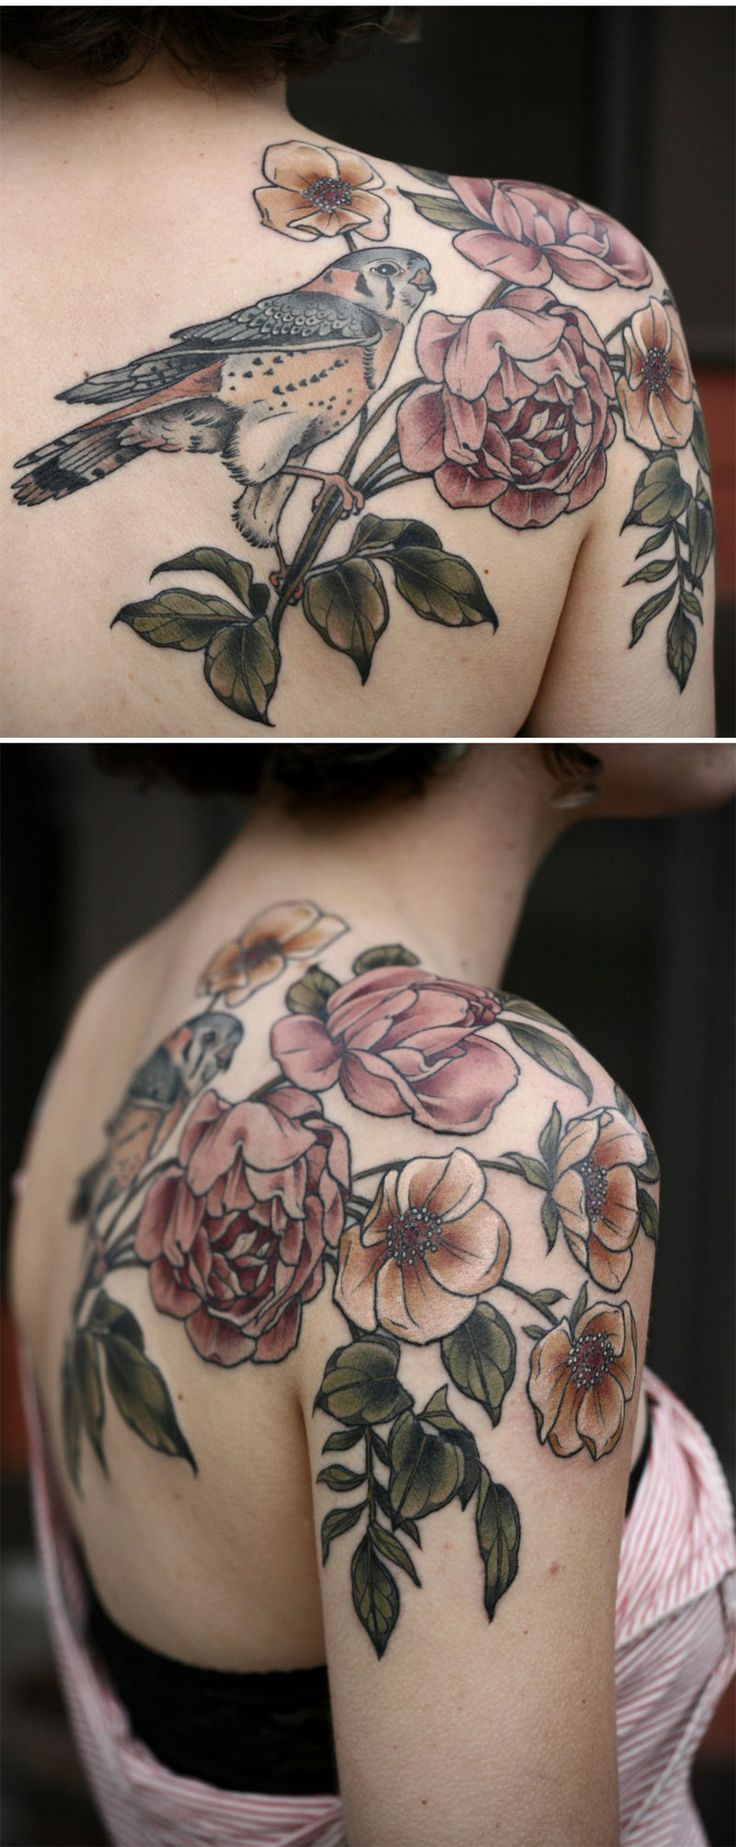 American kestrel with wild roses by Kirsten Holliday @ Wonderland Tattoo - Portl...